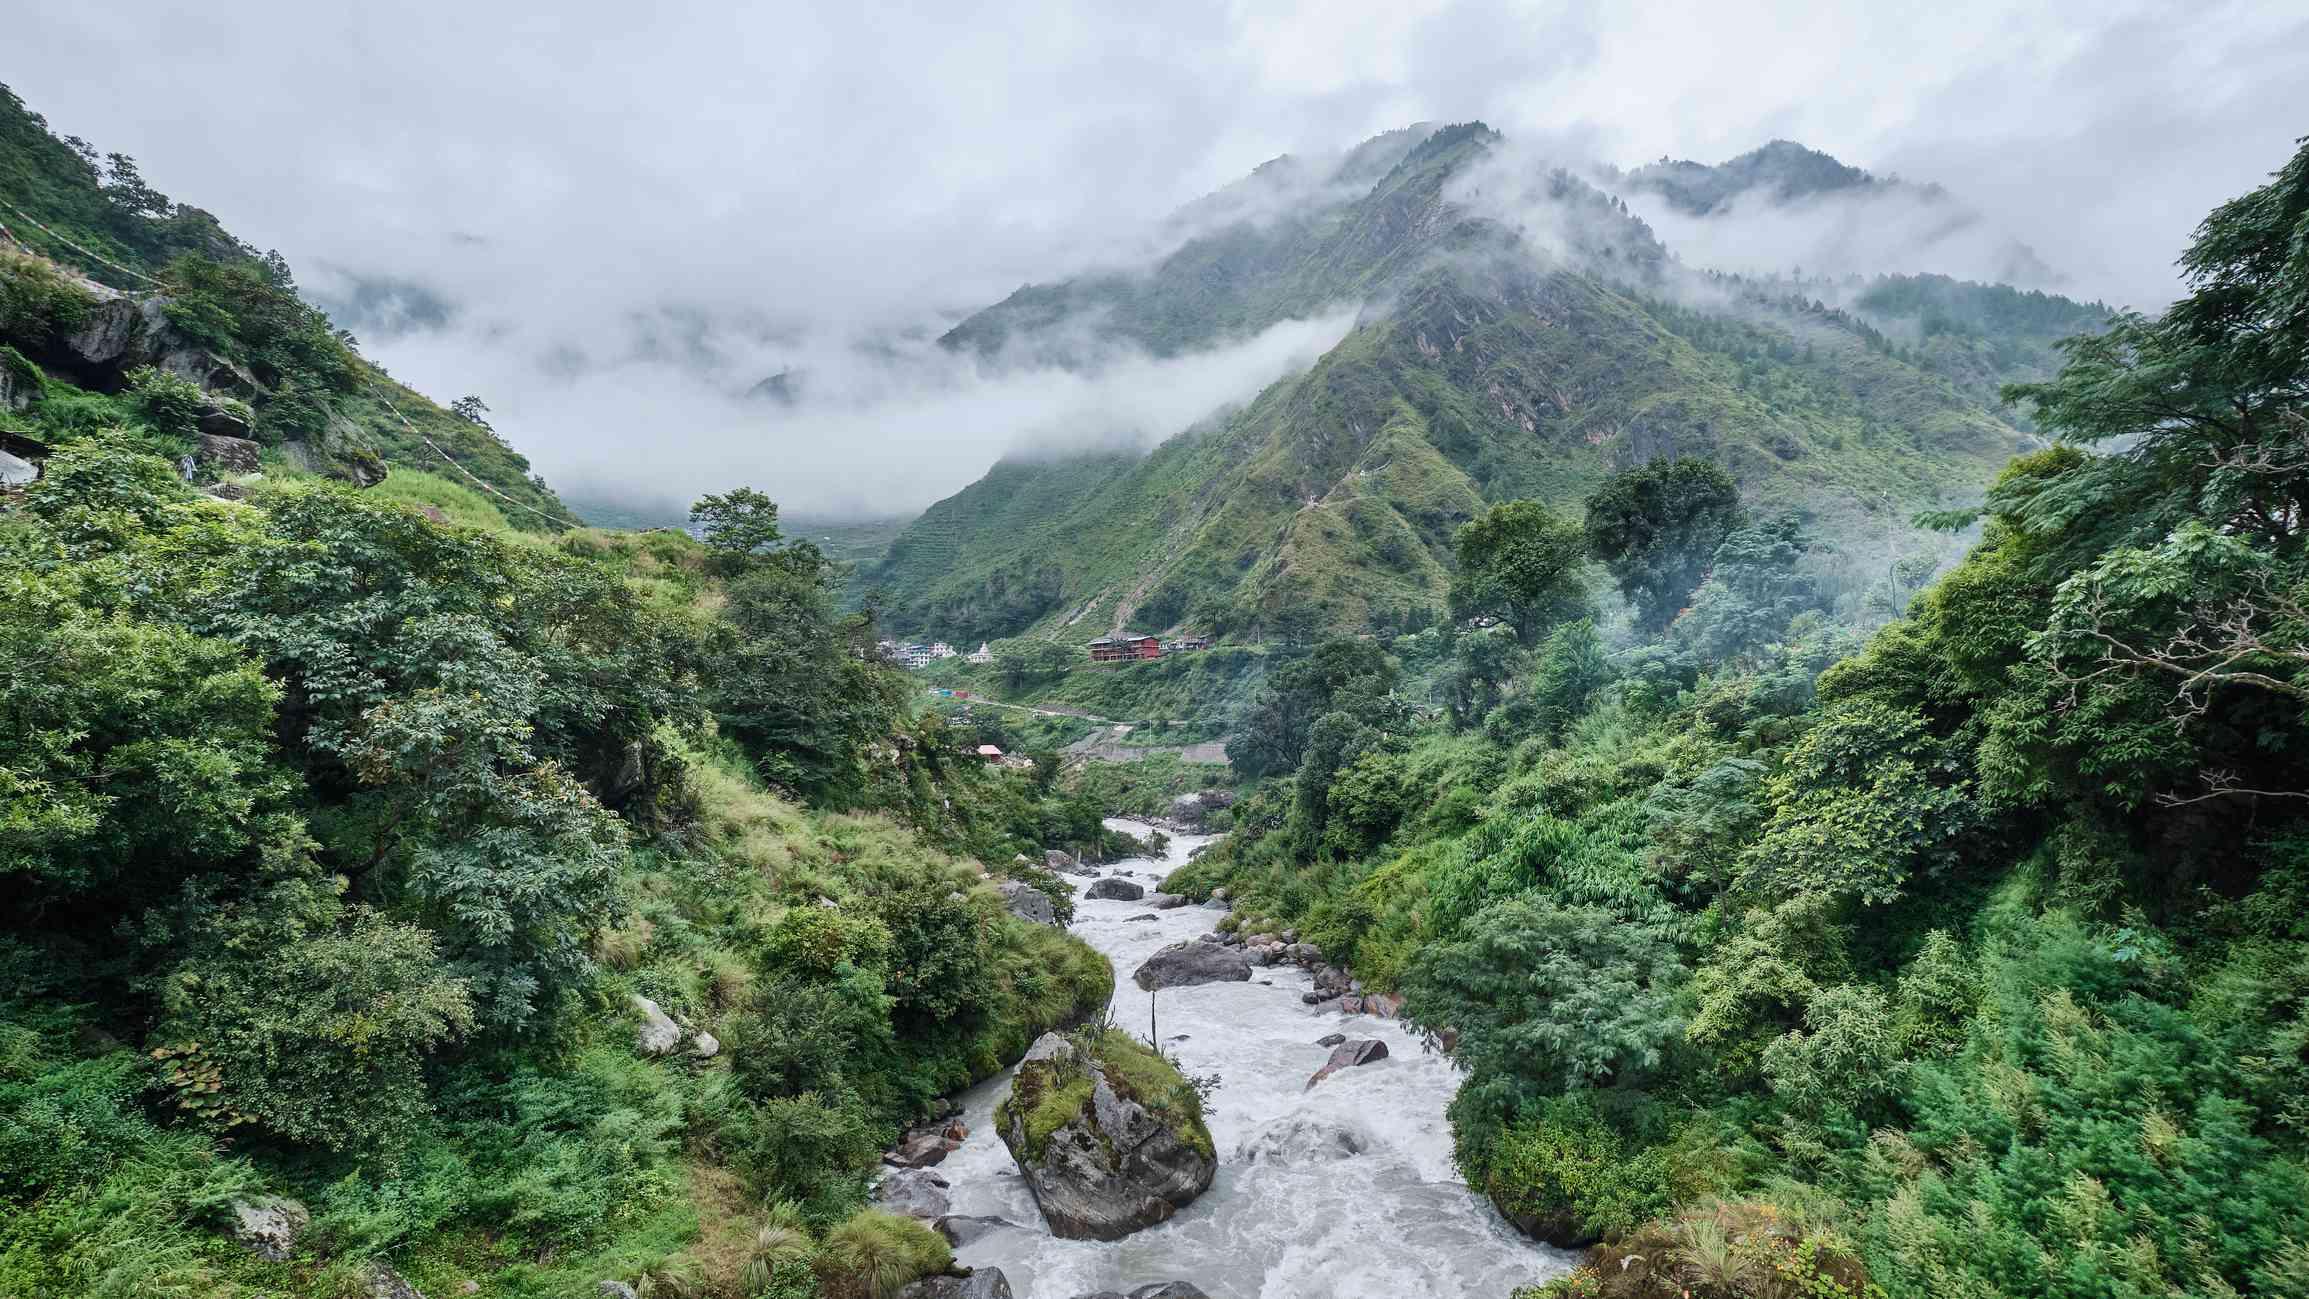 Langtang Khola intersecting Trishuli River